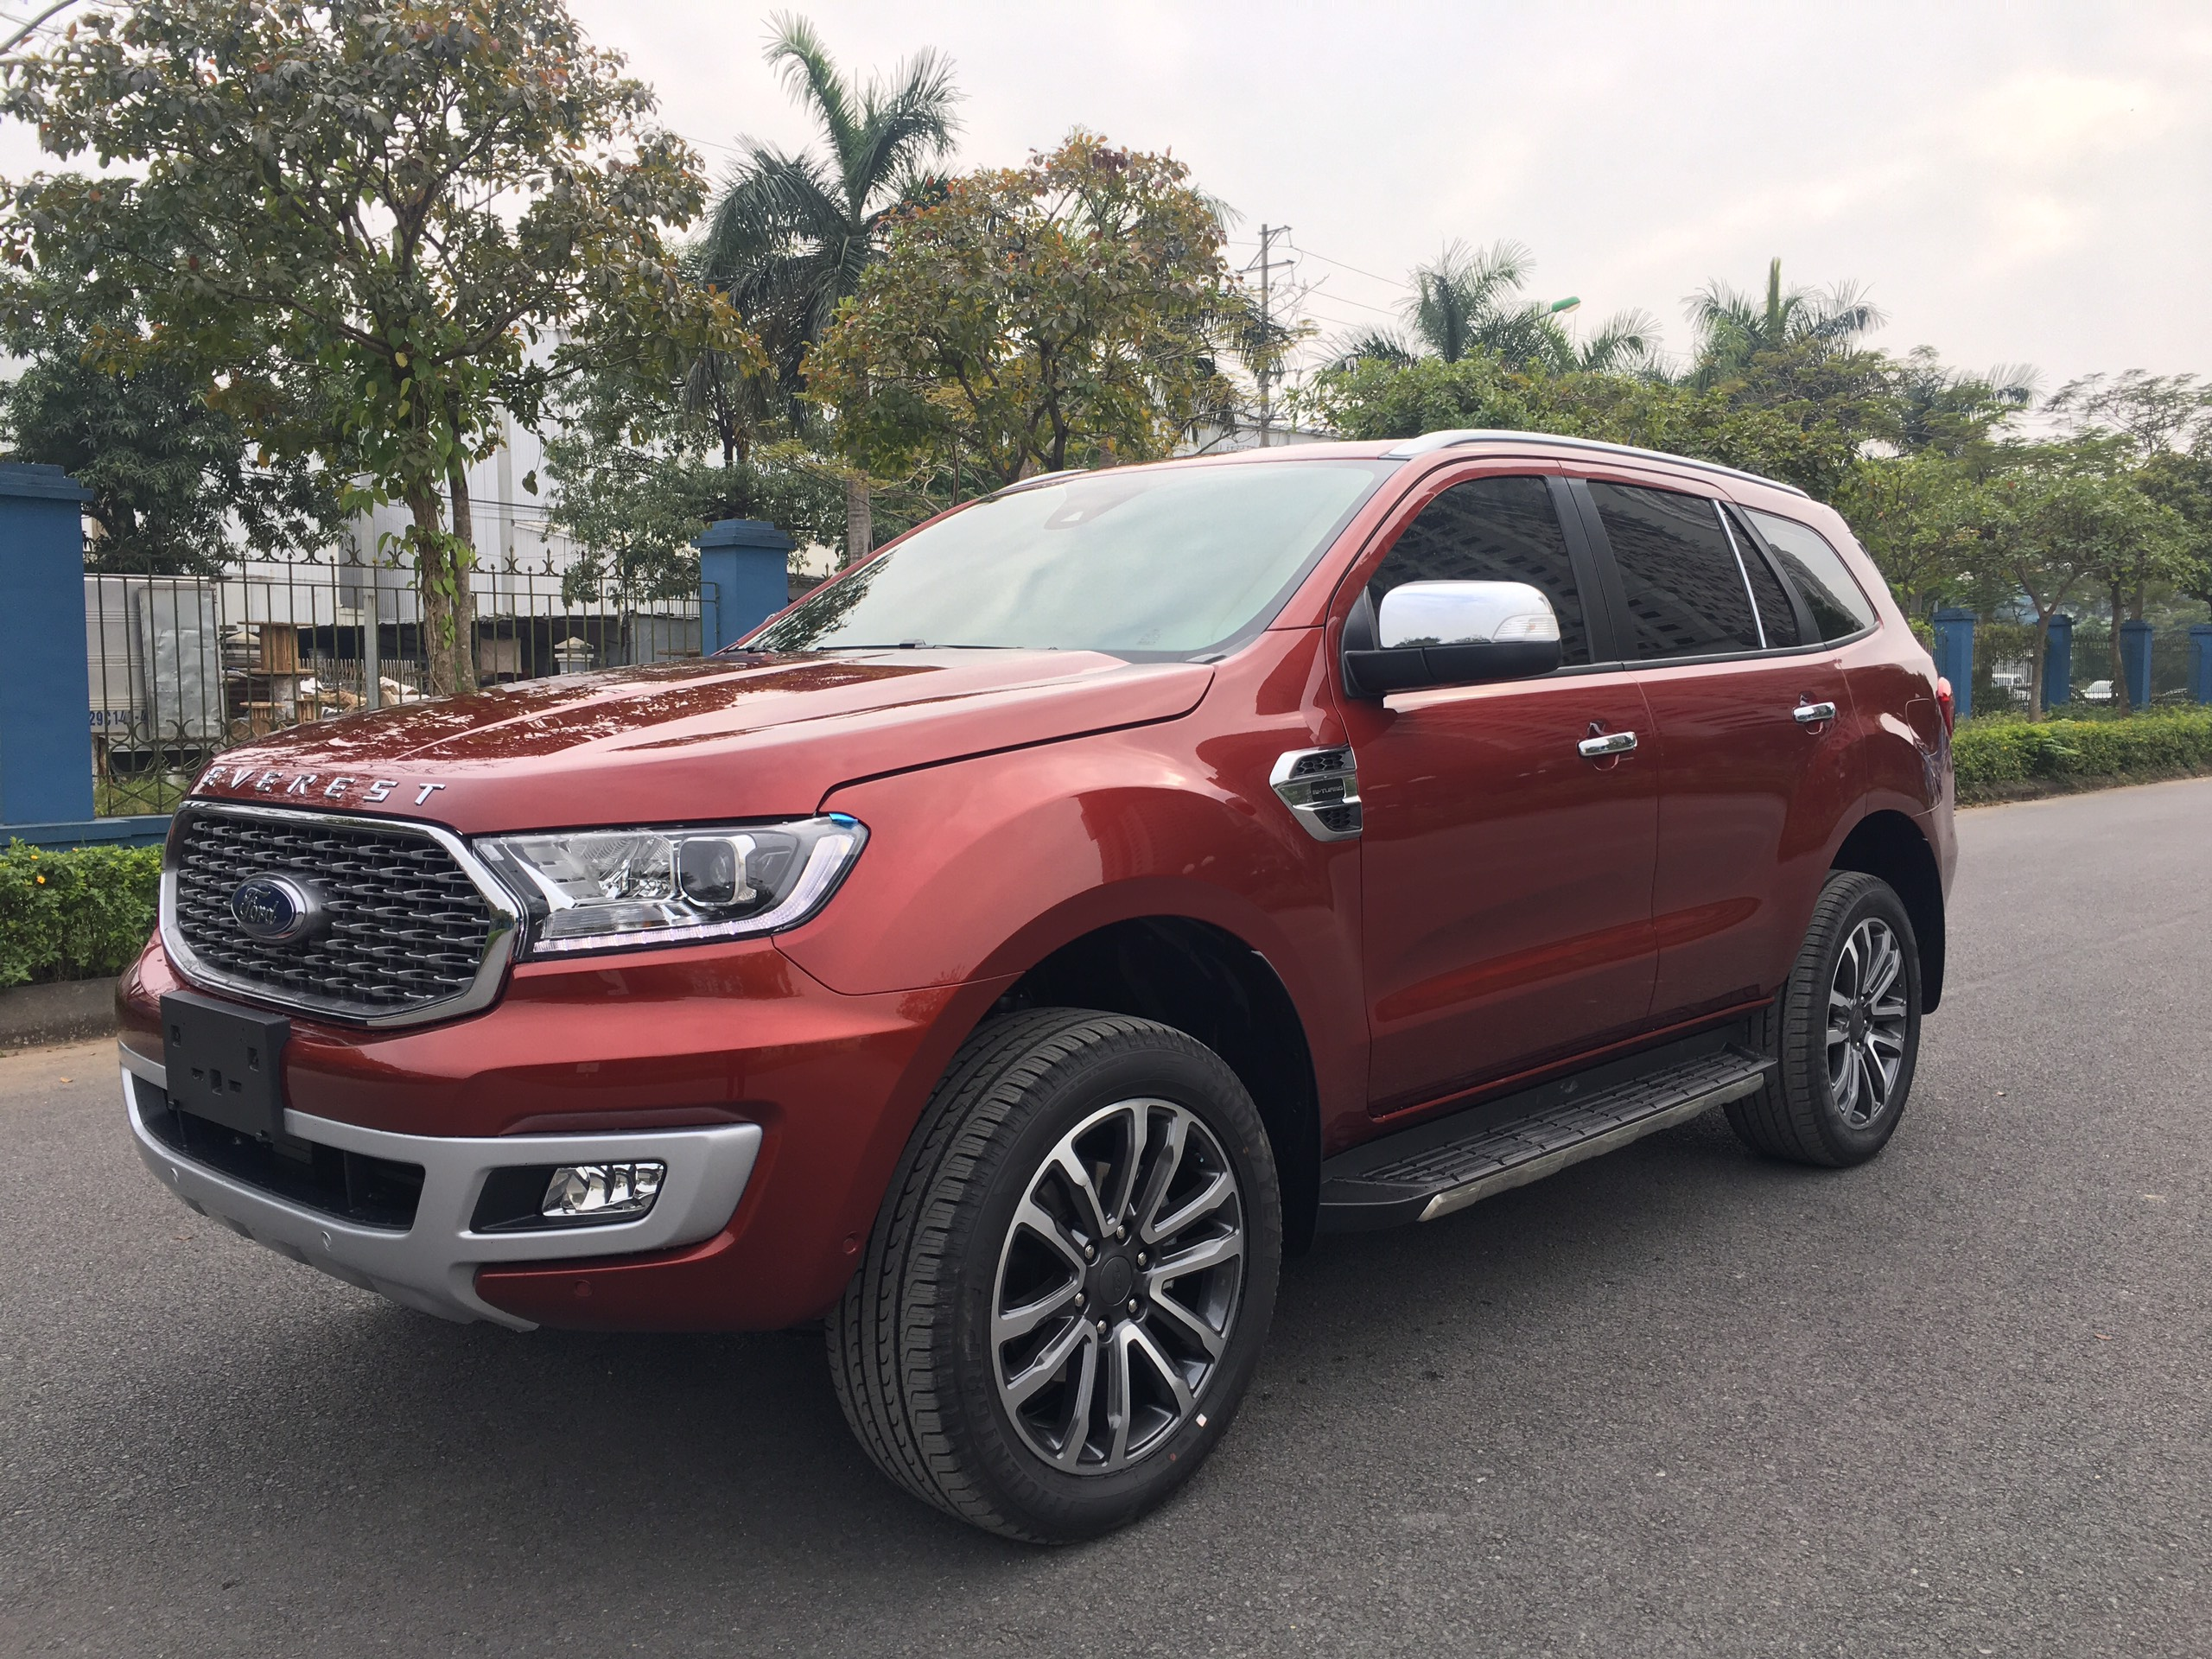 Ford Everest Titanium 2.0L AT 4WD2